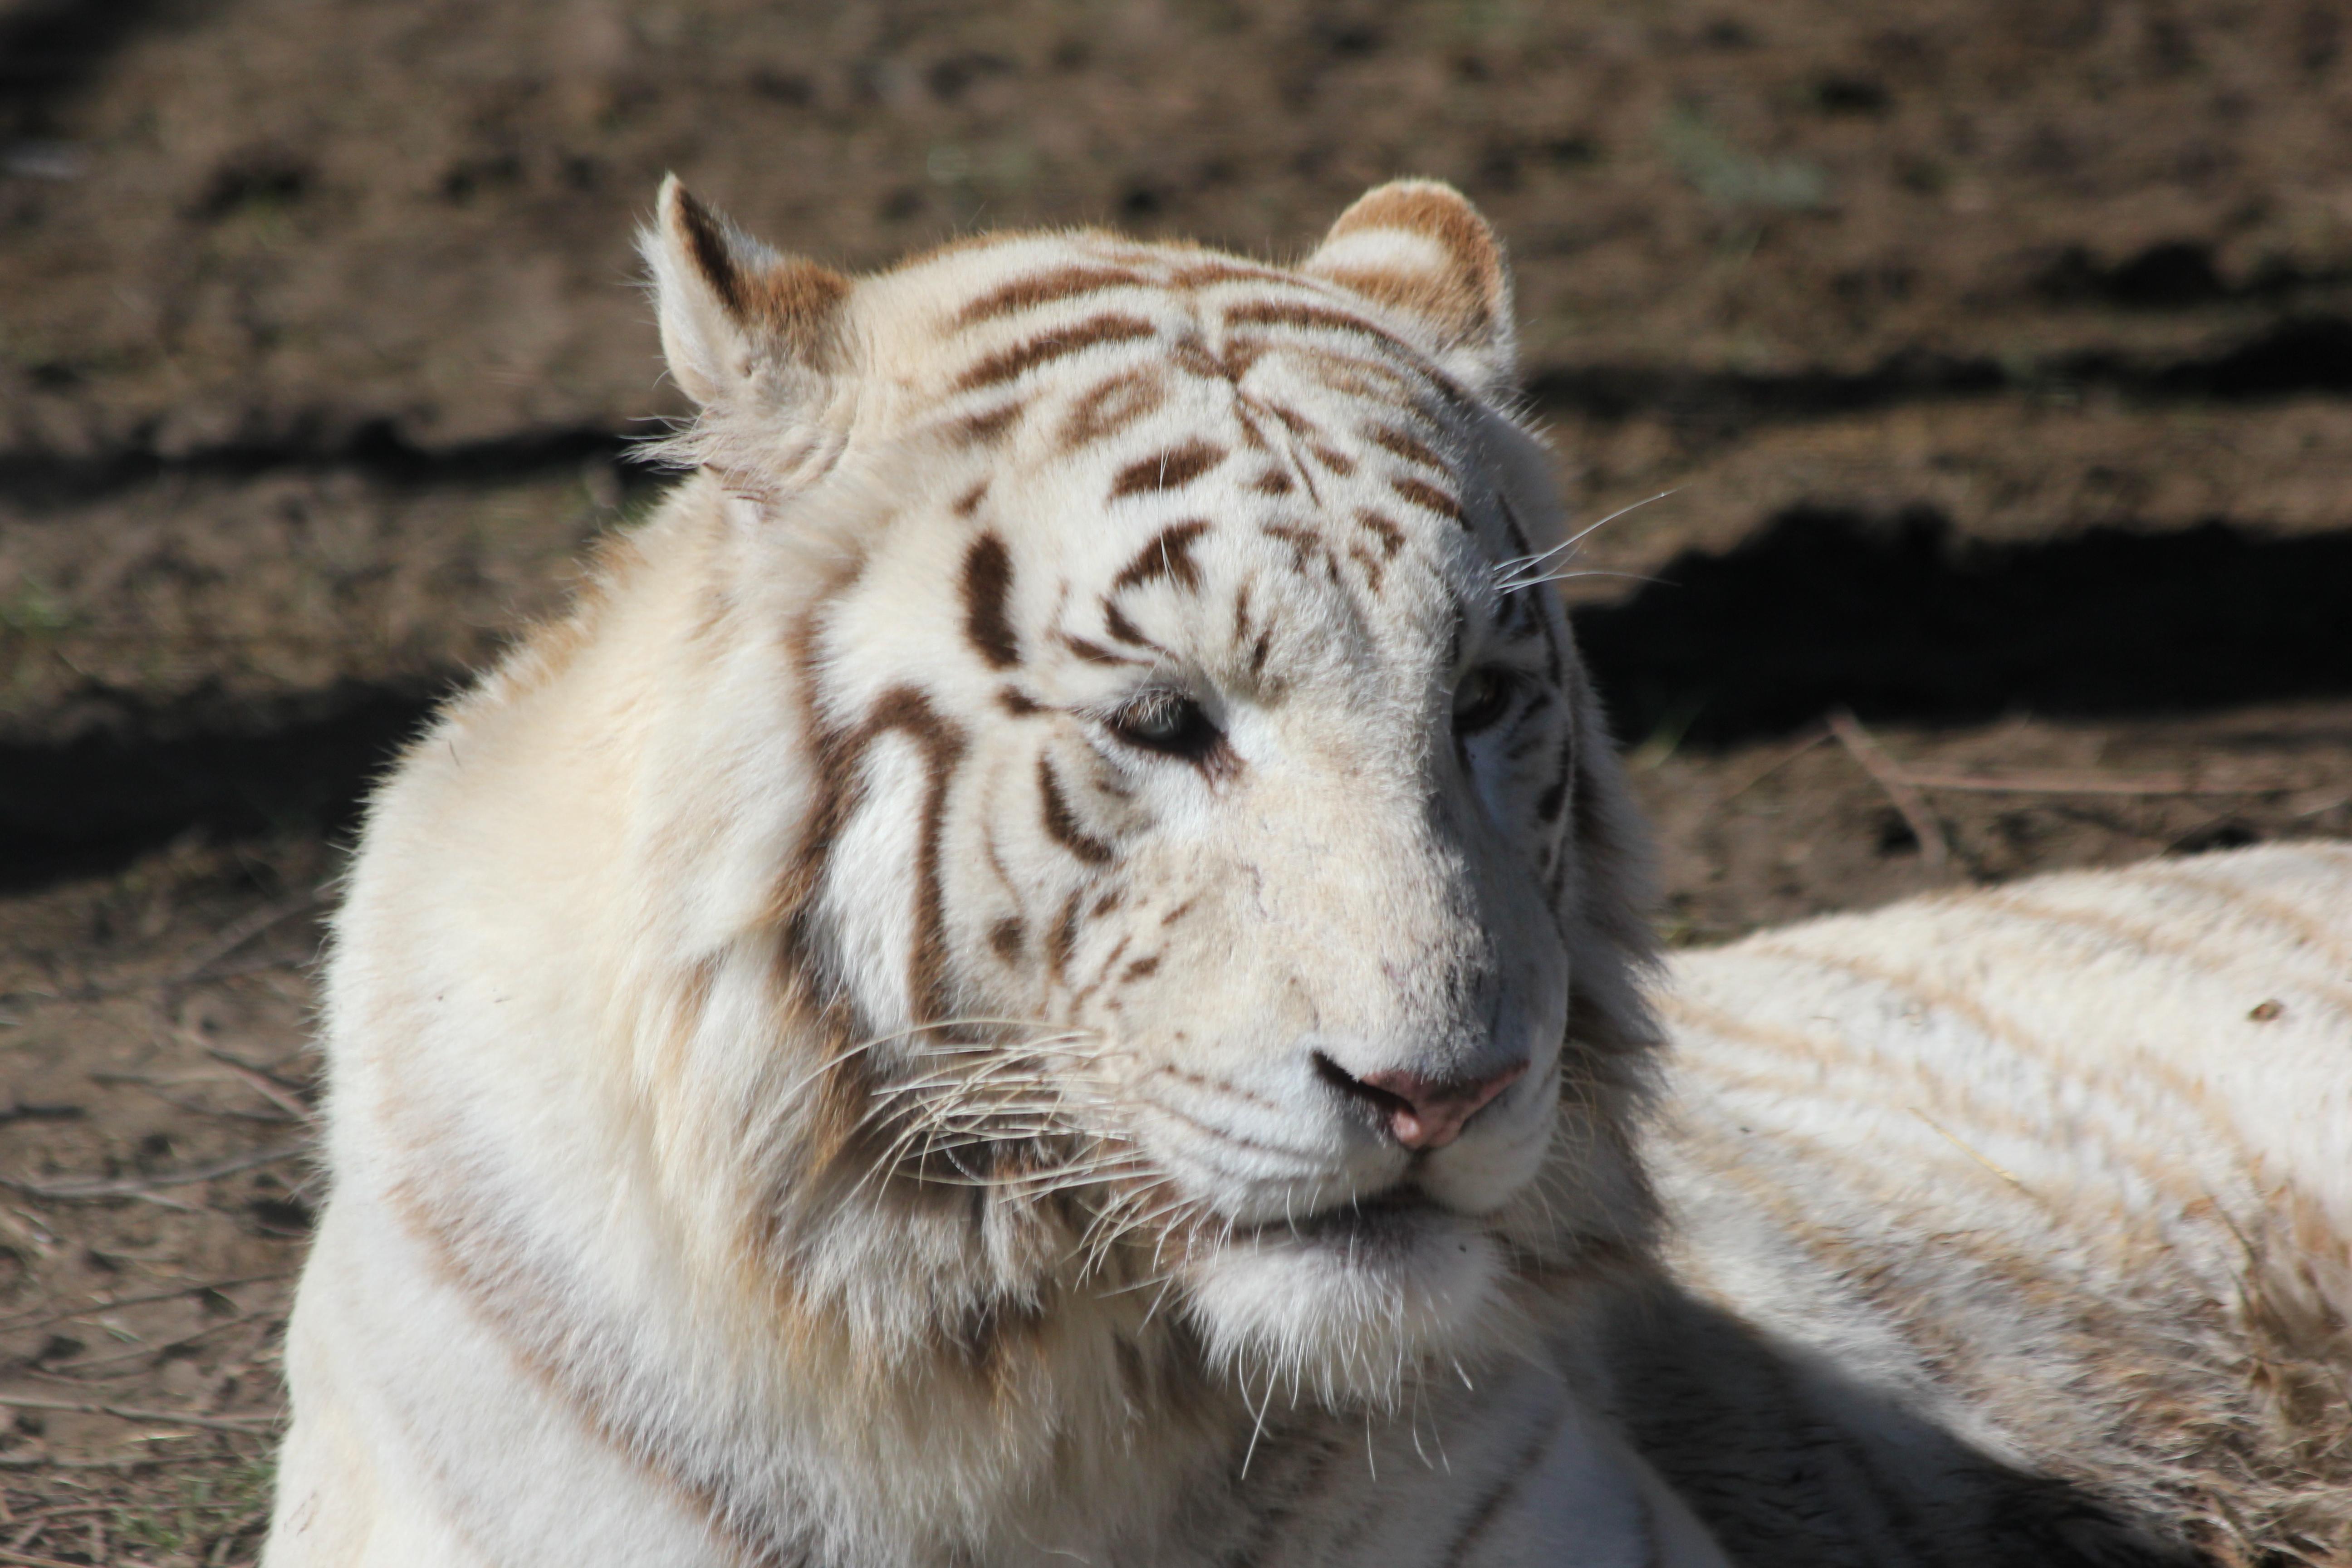 Tigre del bengala photo